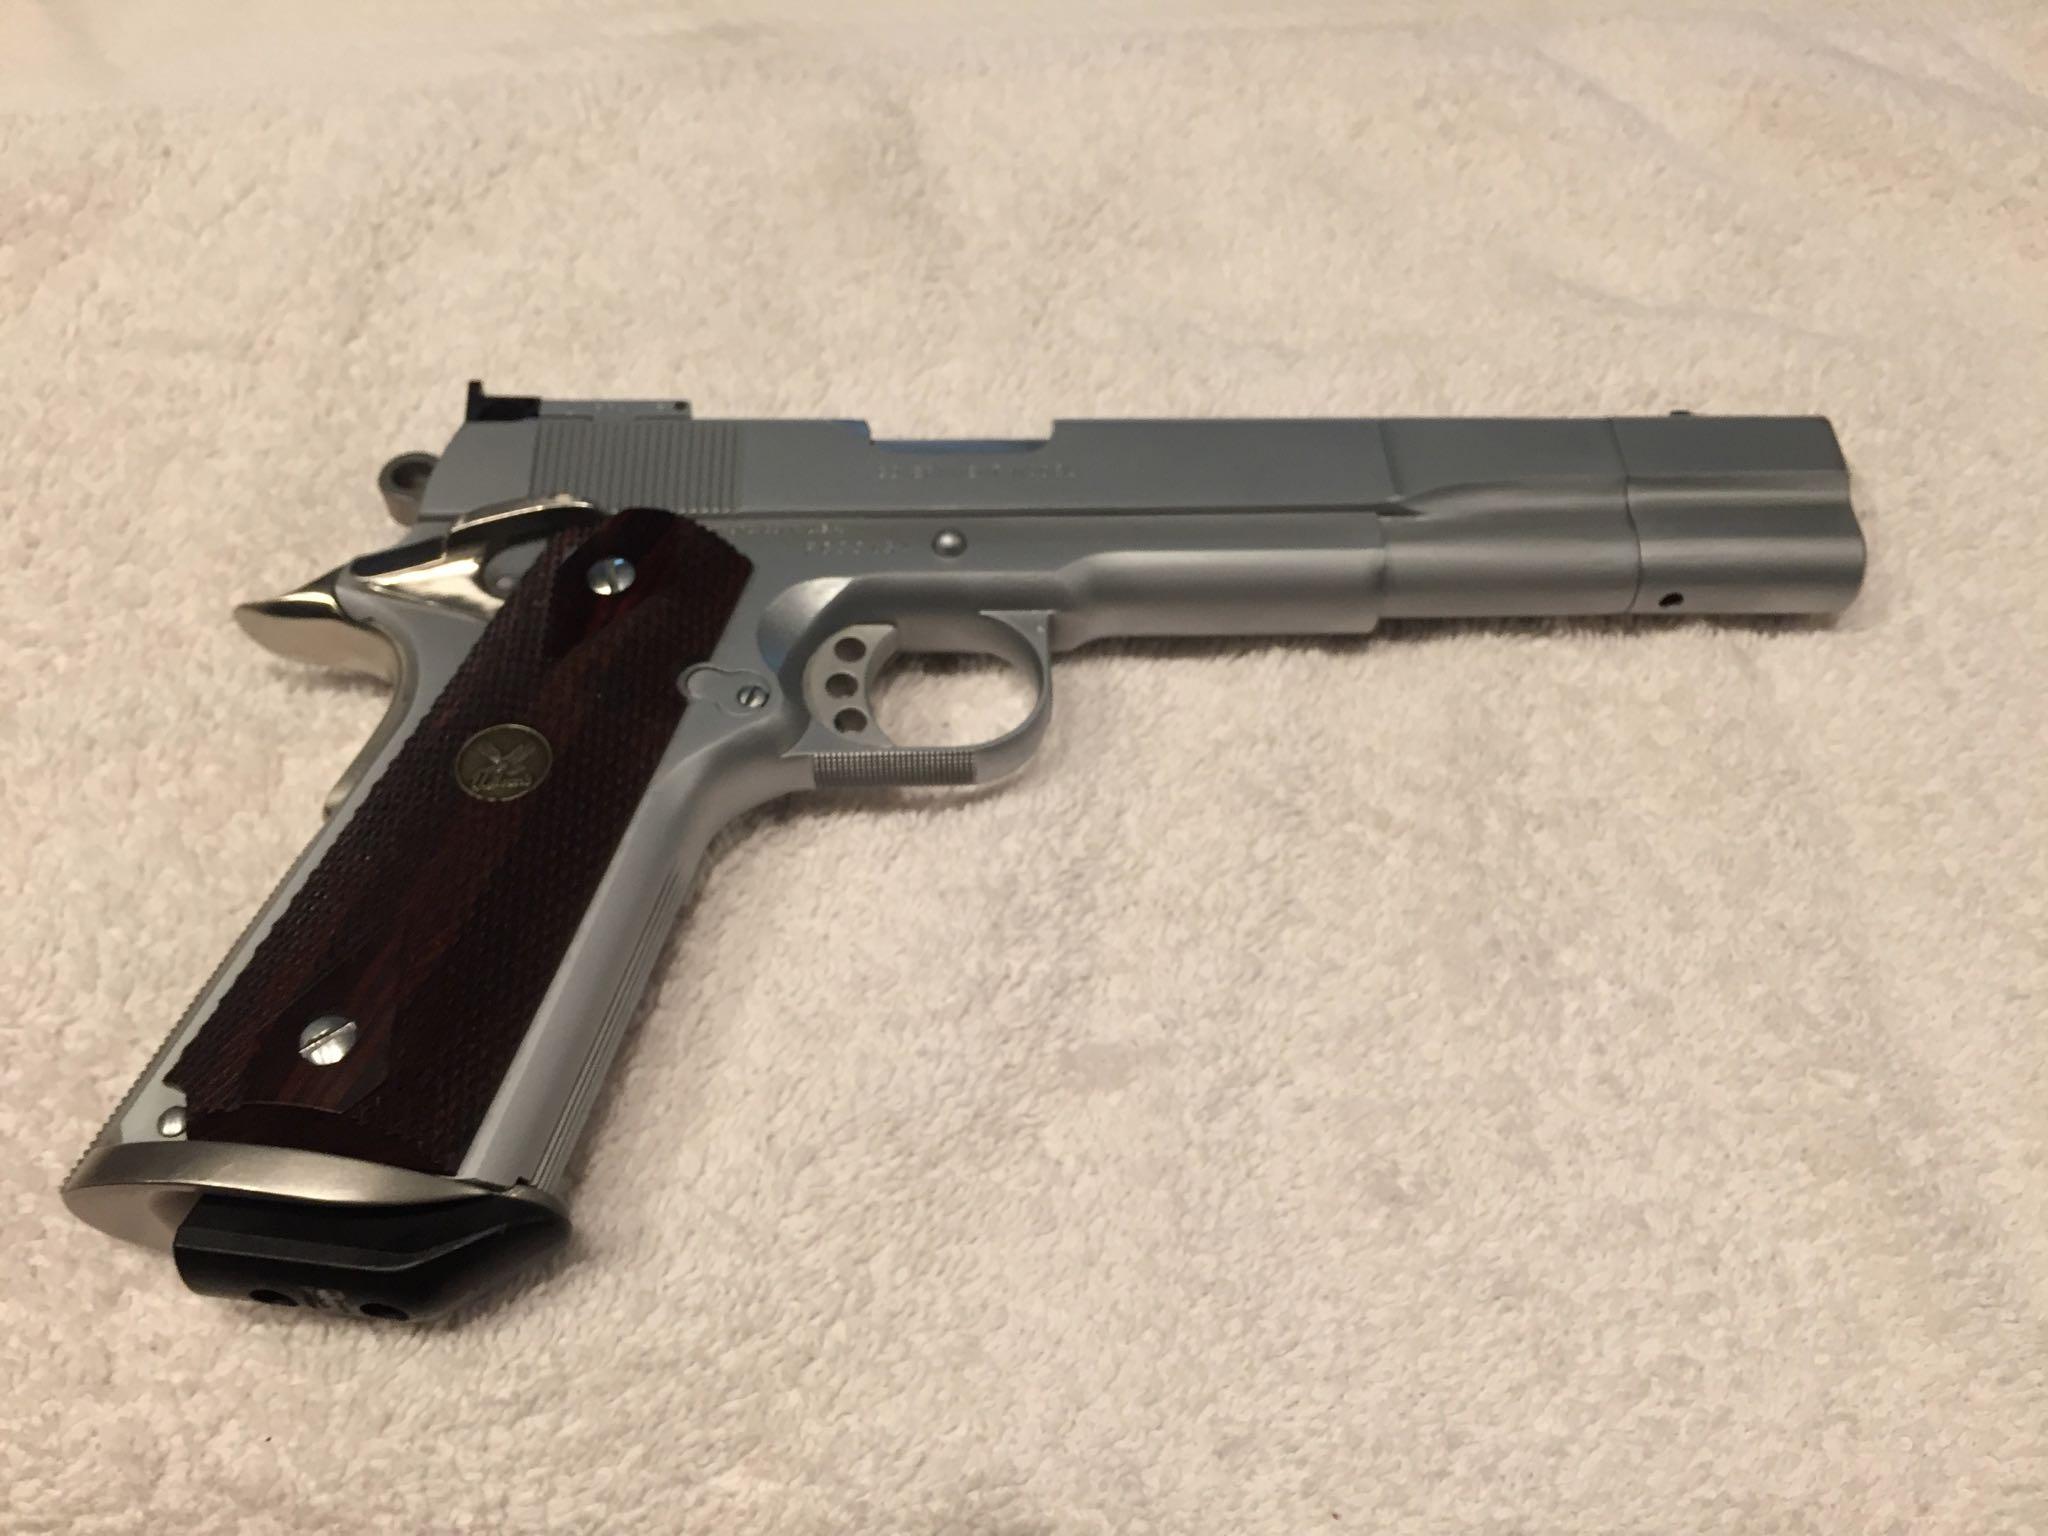 1911 Gun - Colt (Semi-automatic Pistol) front image (front cover)